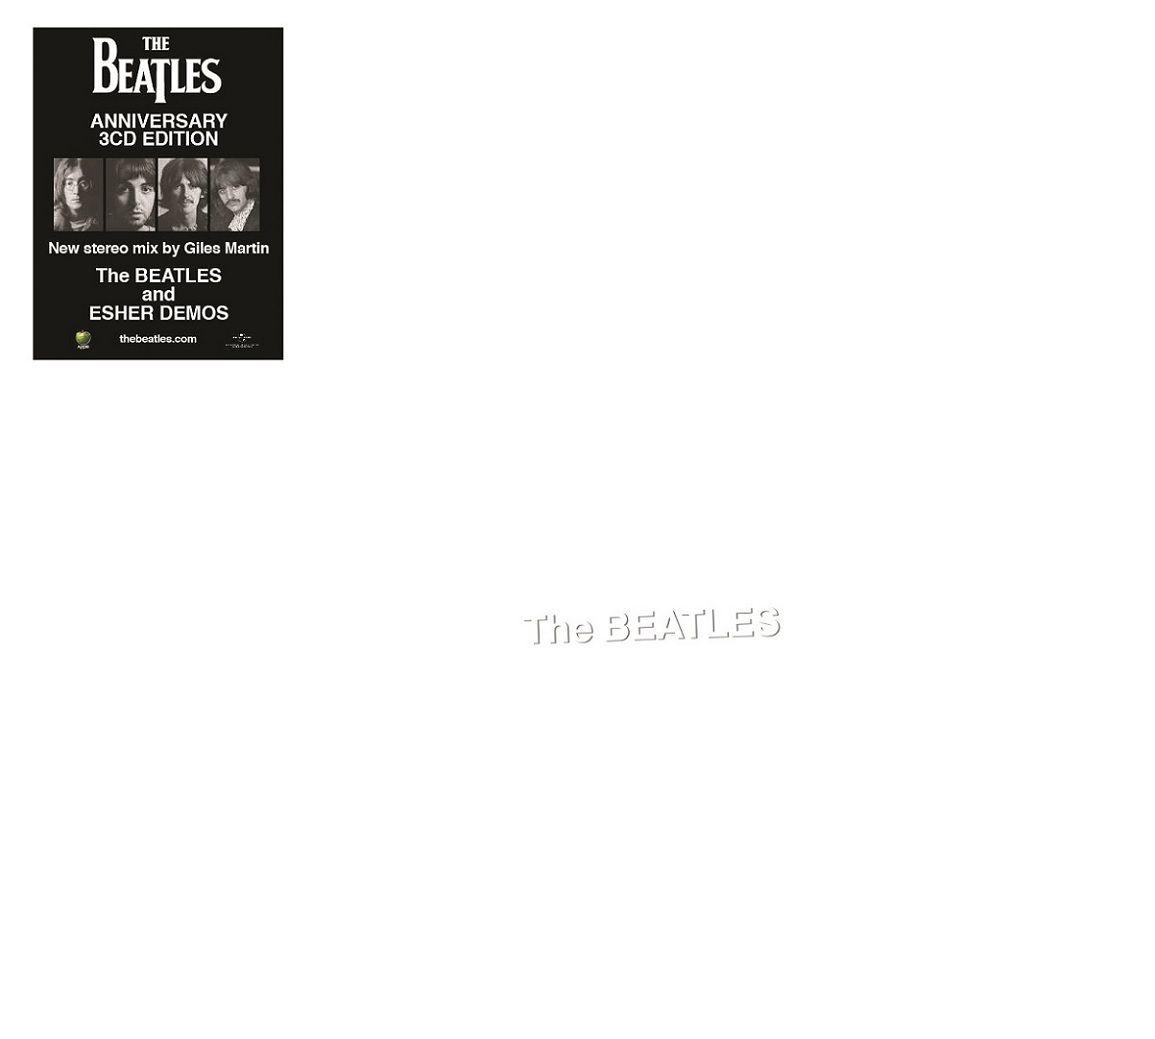 The Beatles - White Album / Deluxe 3 CDs